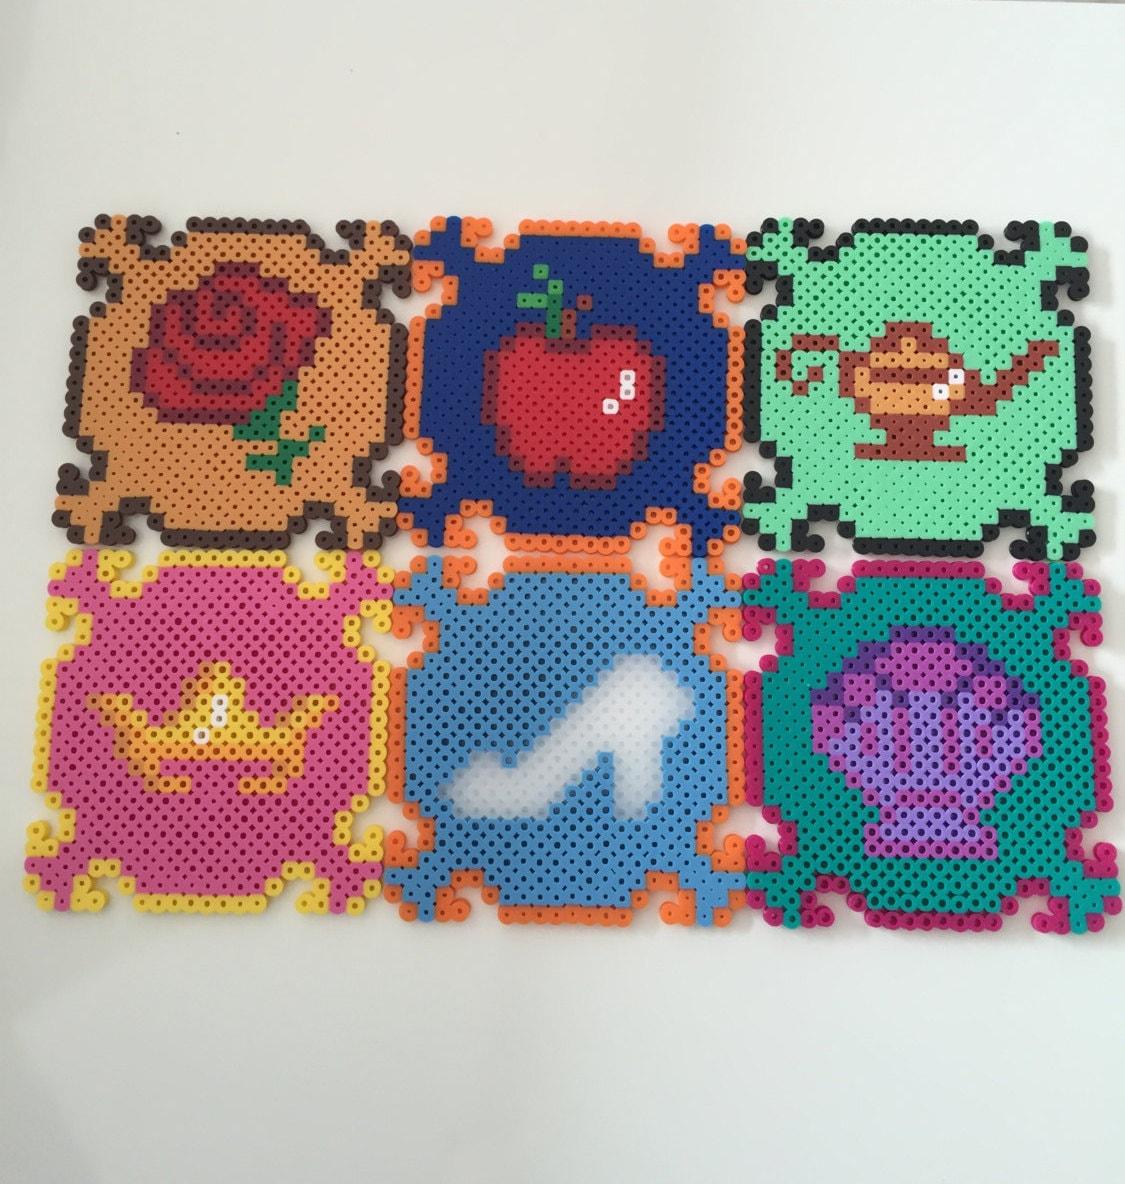 Princess Beads: Disney Princess Perler Bead Coasters Set Of 6